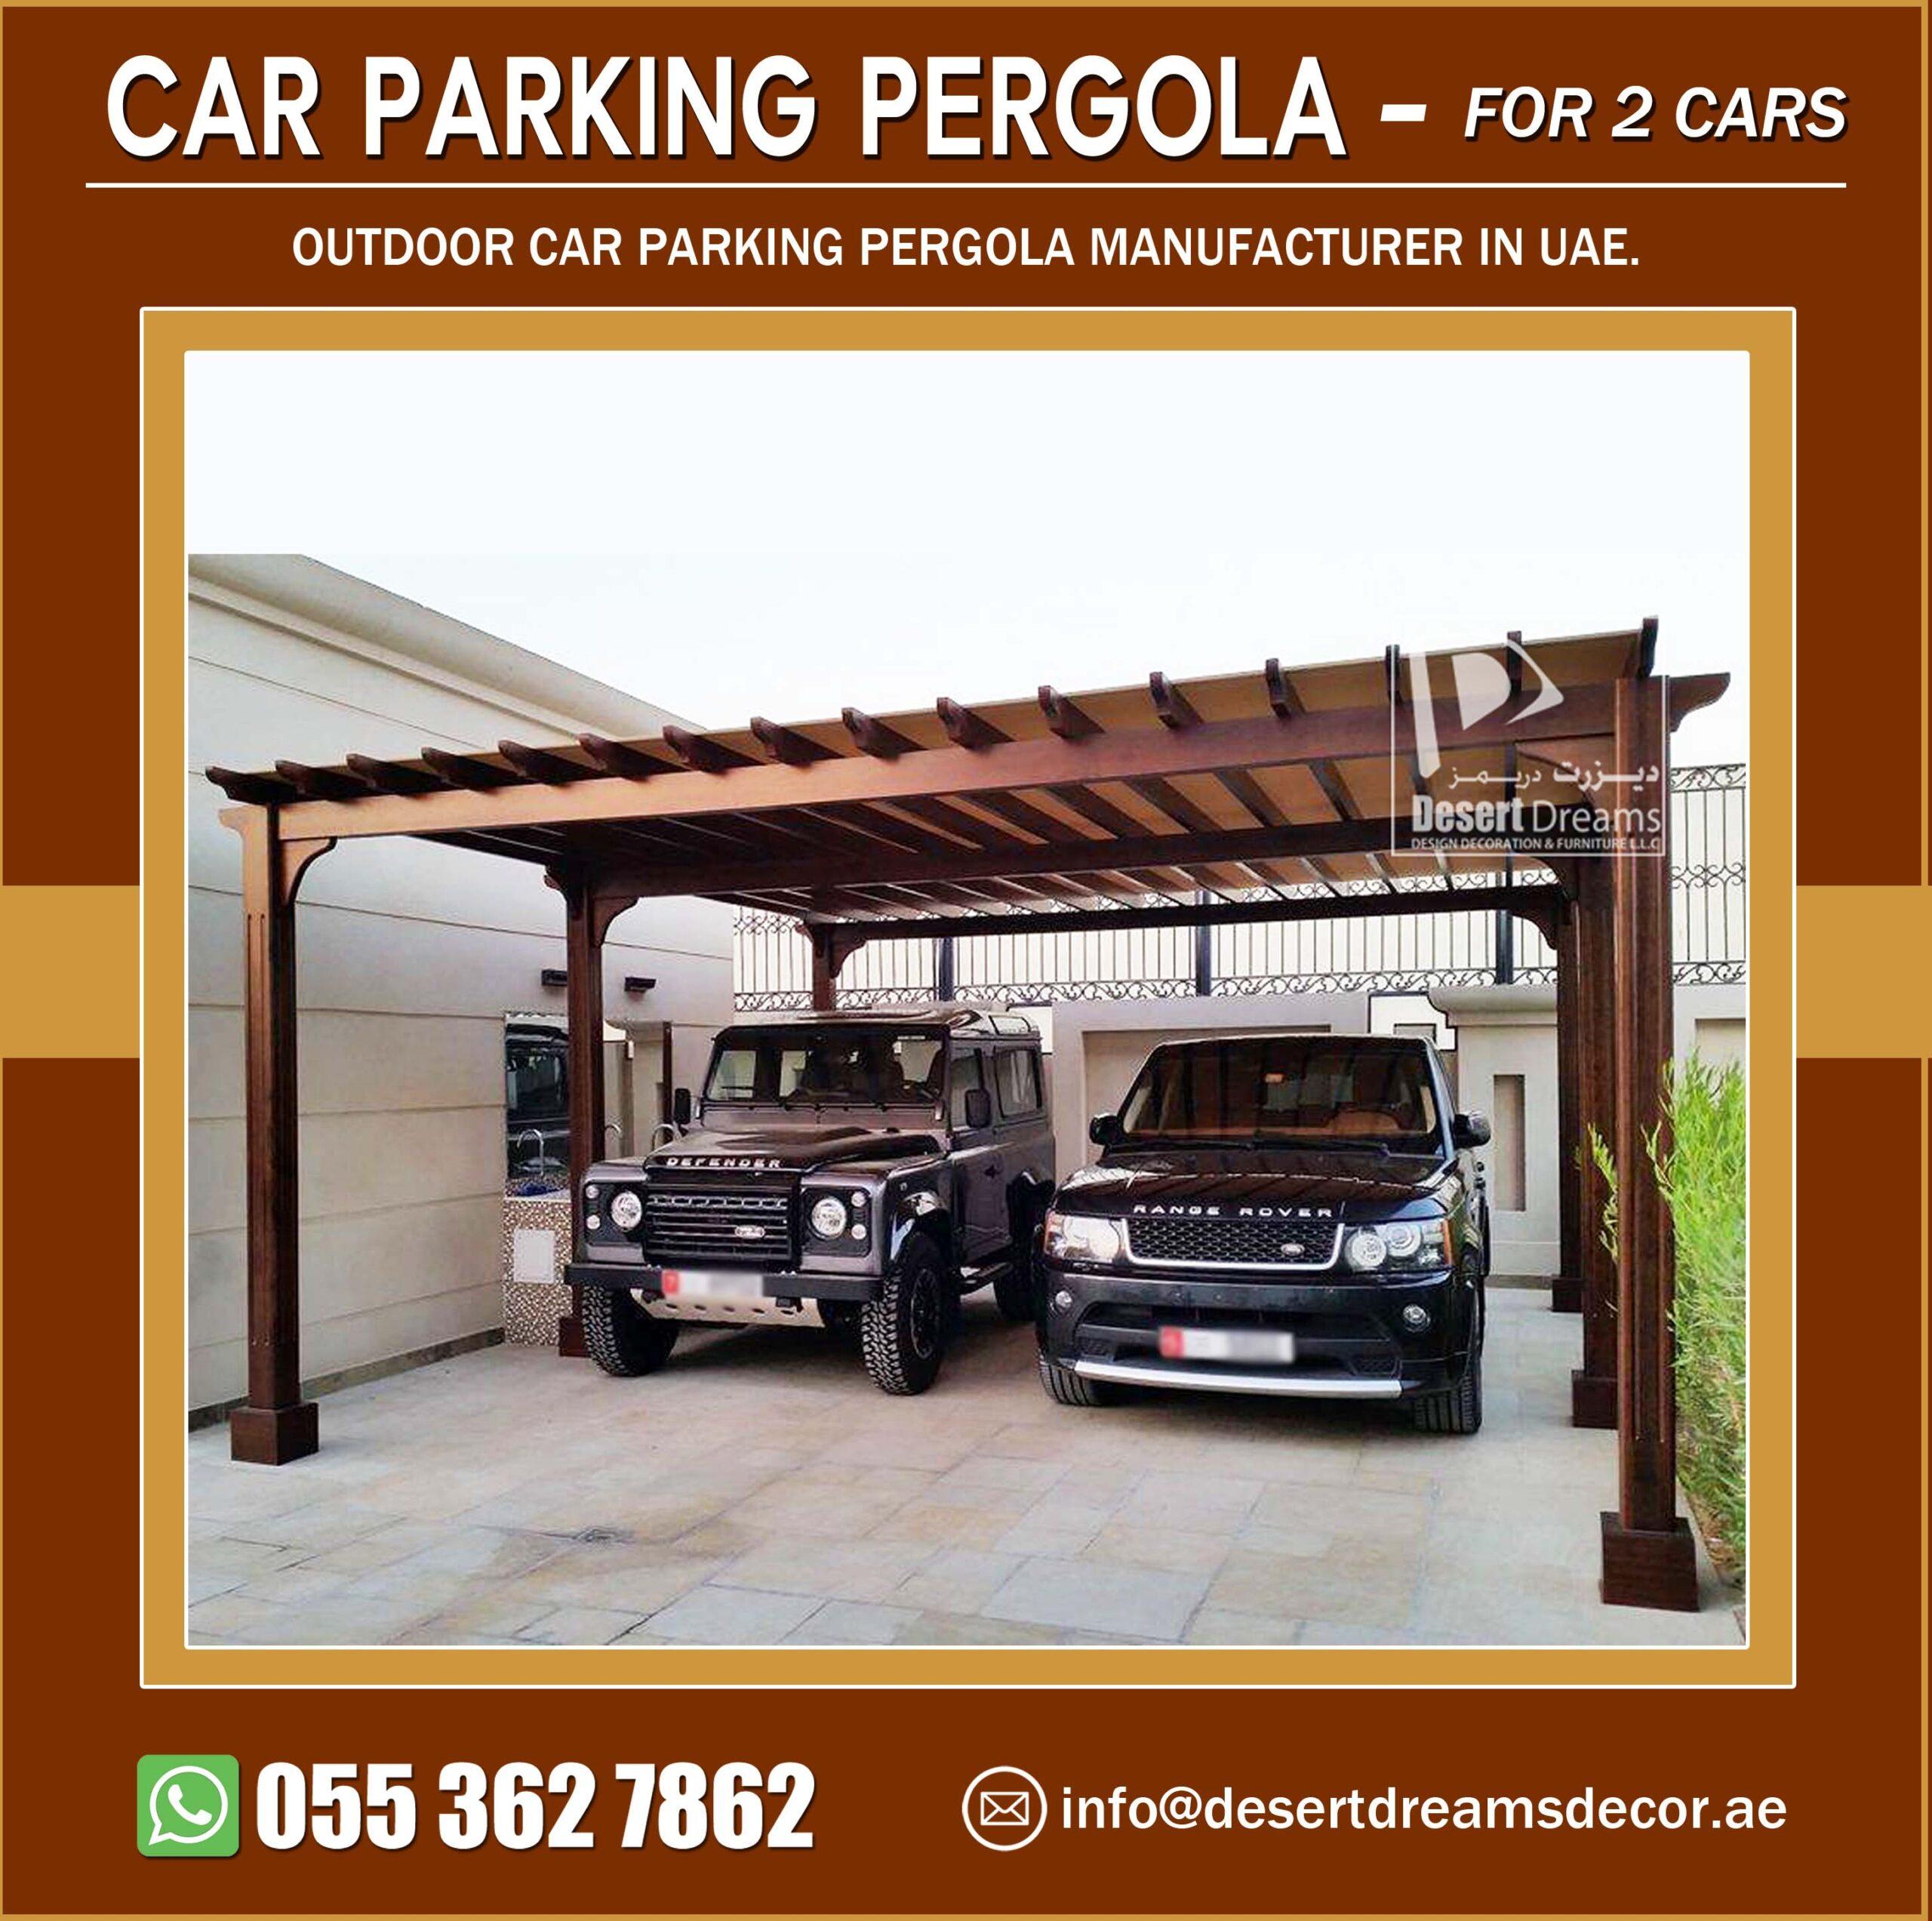 Two Cars Parking Pergola Manufacturer in UAE.jpg